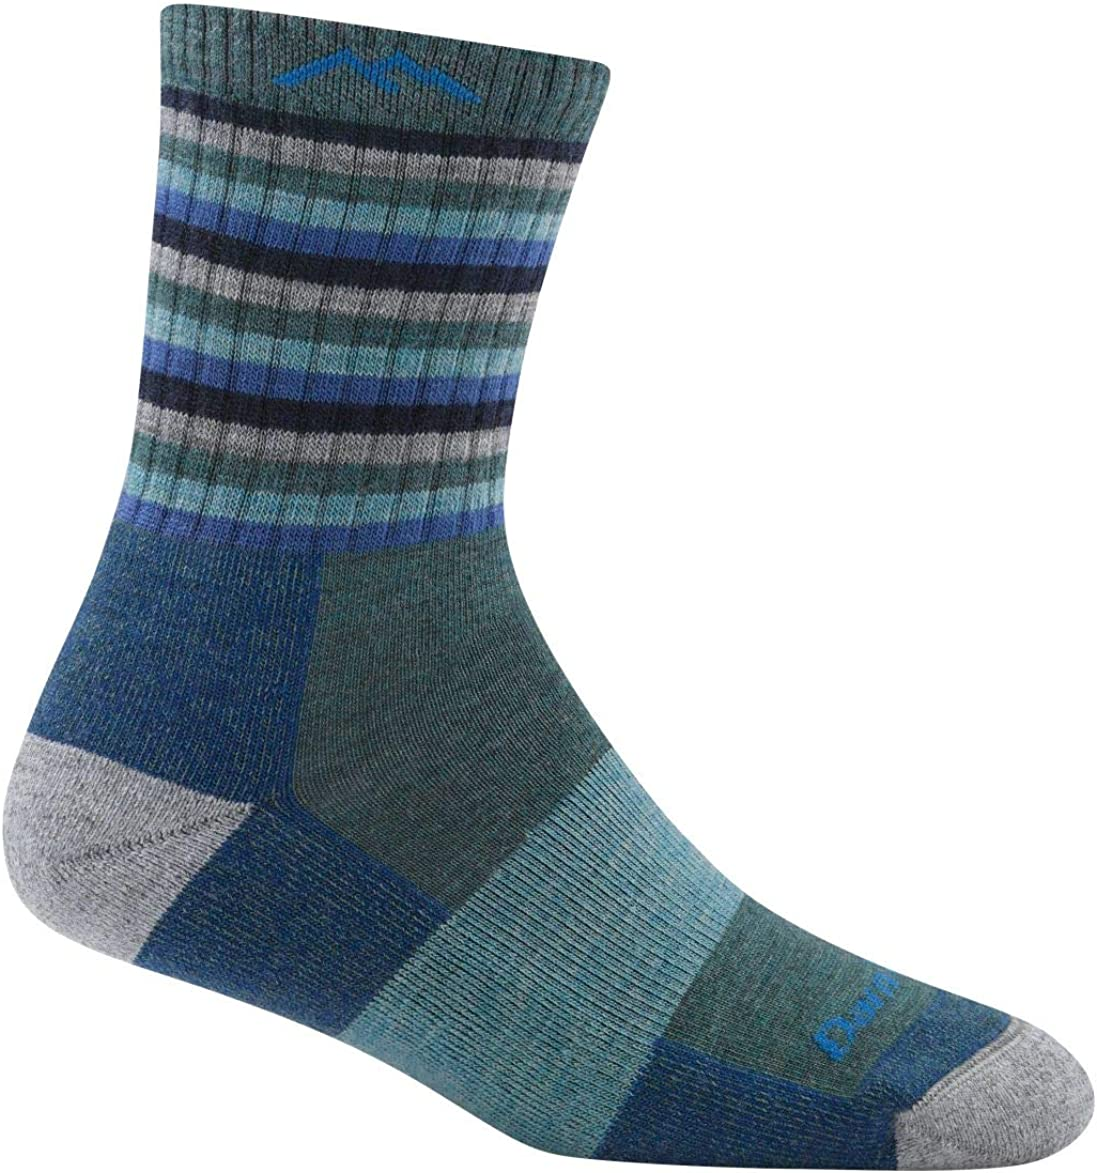 Womens Darn Tough Hike//Trek Micro Cushion Stripe Crew Socks